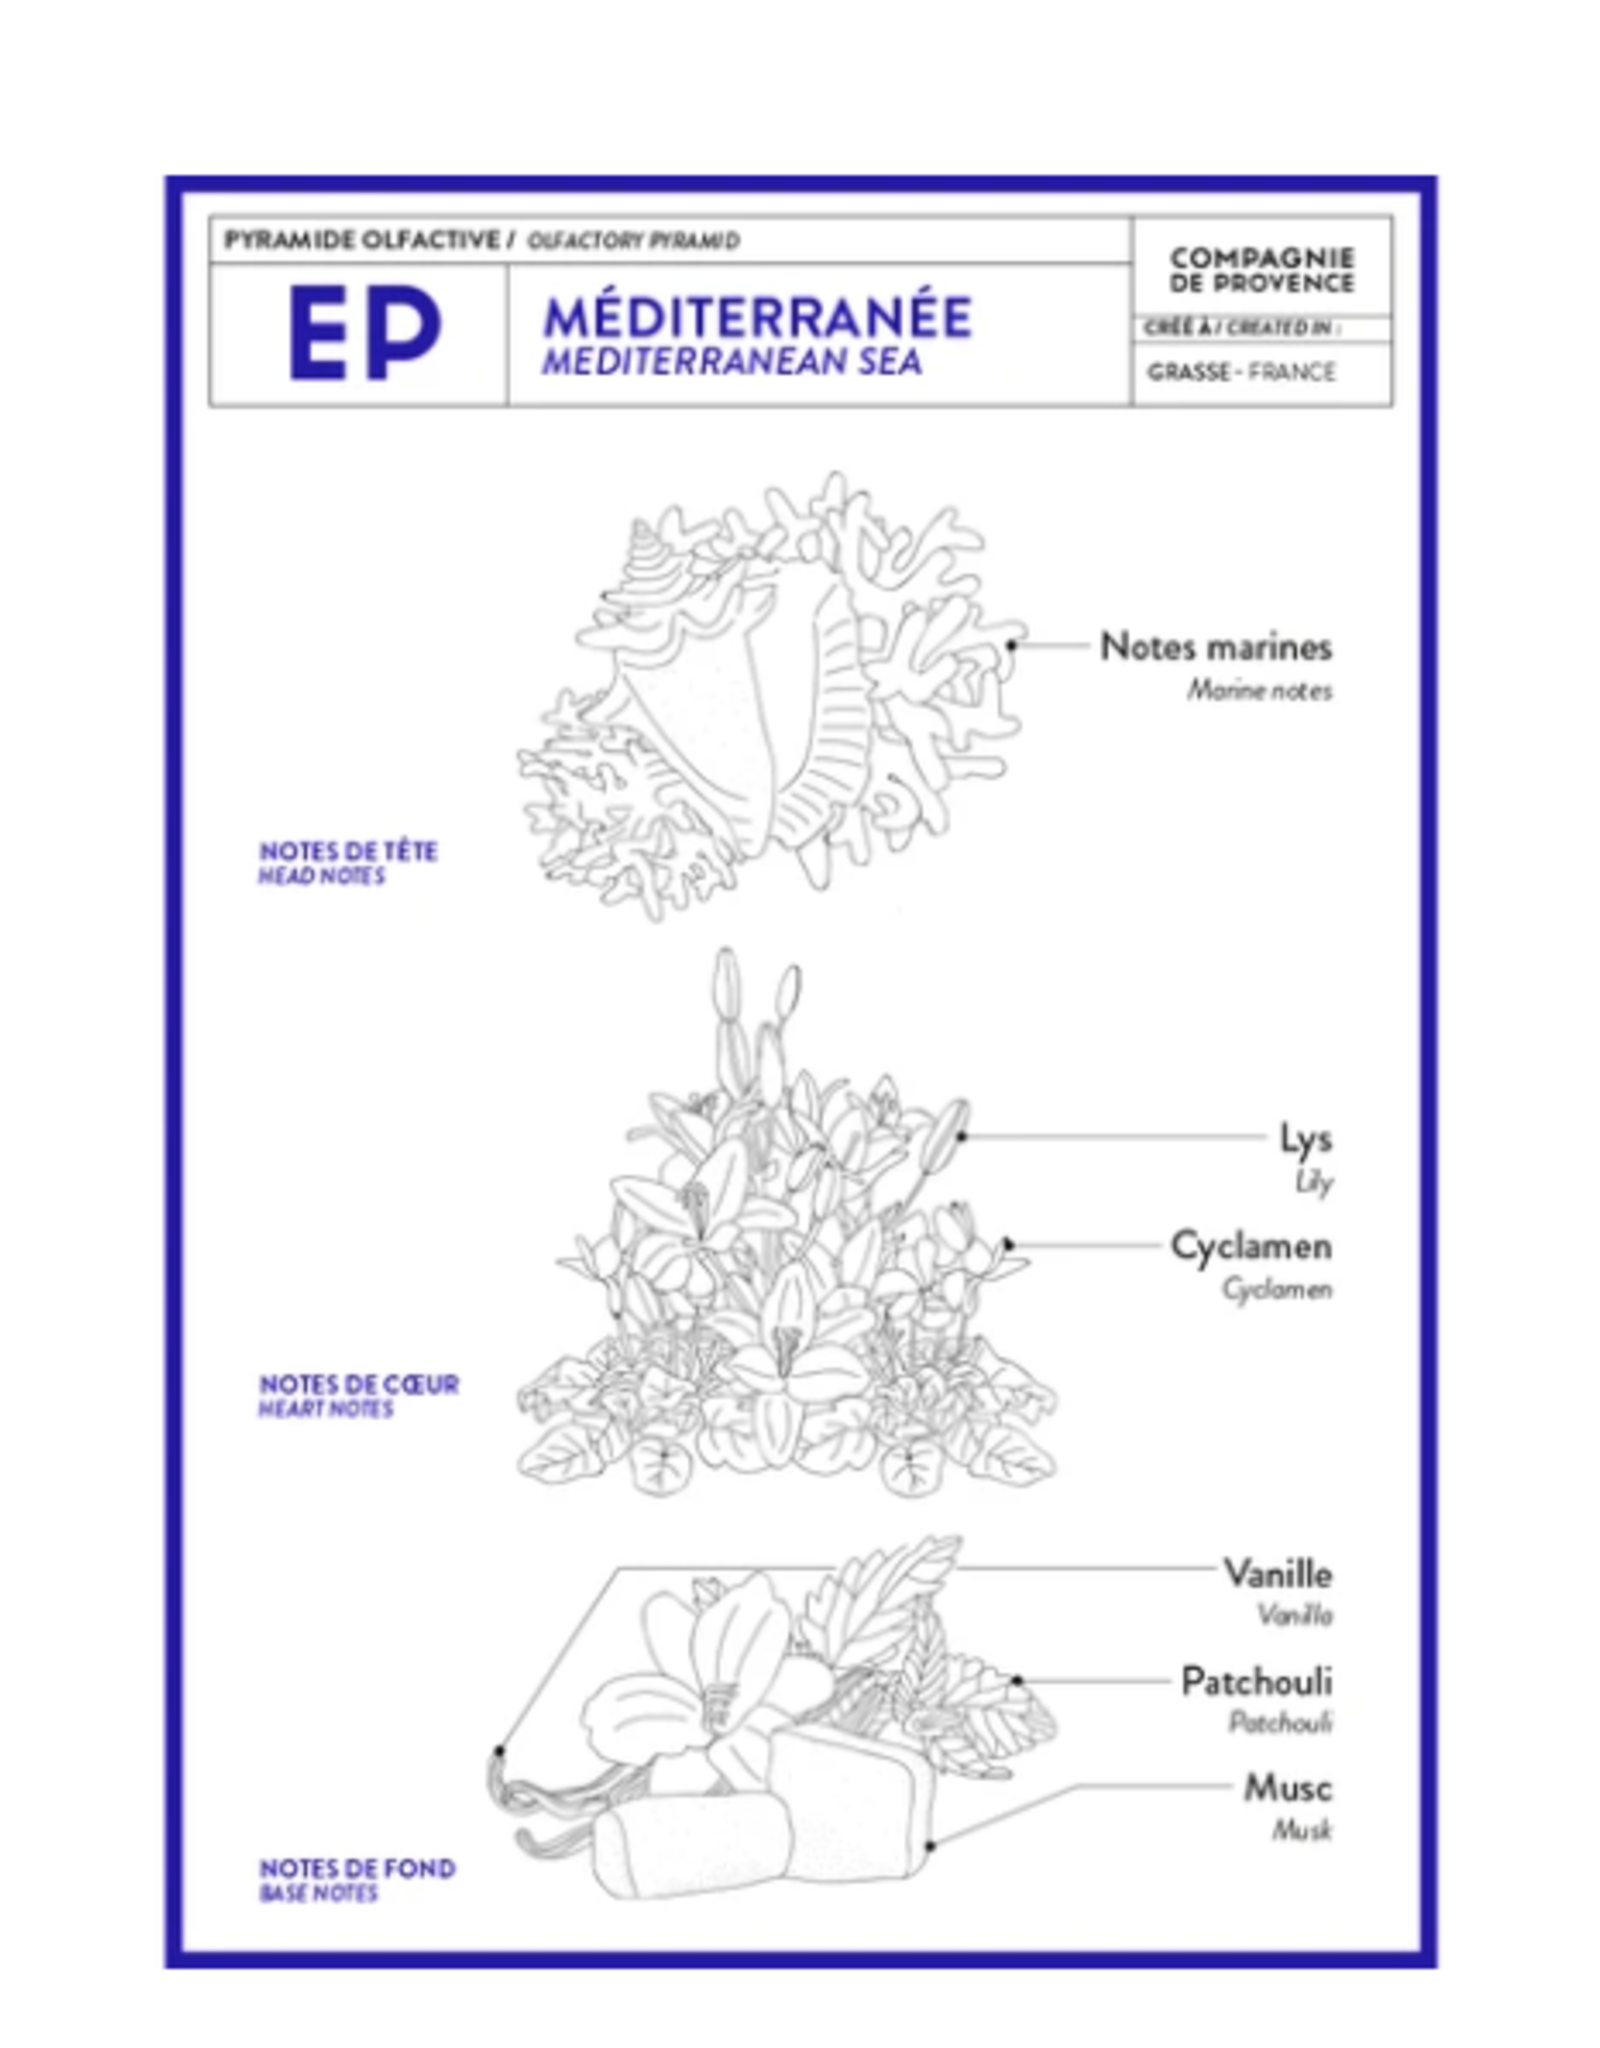 Refill Soap Mediterranean Sea 33.8 fl oz